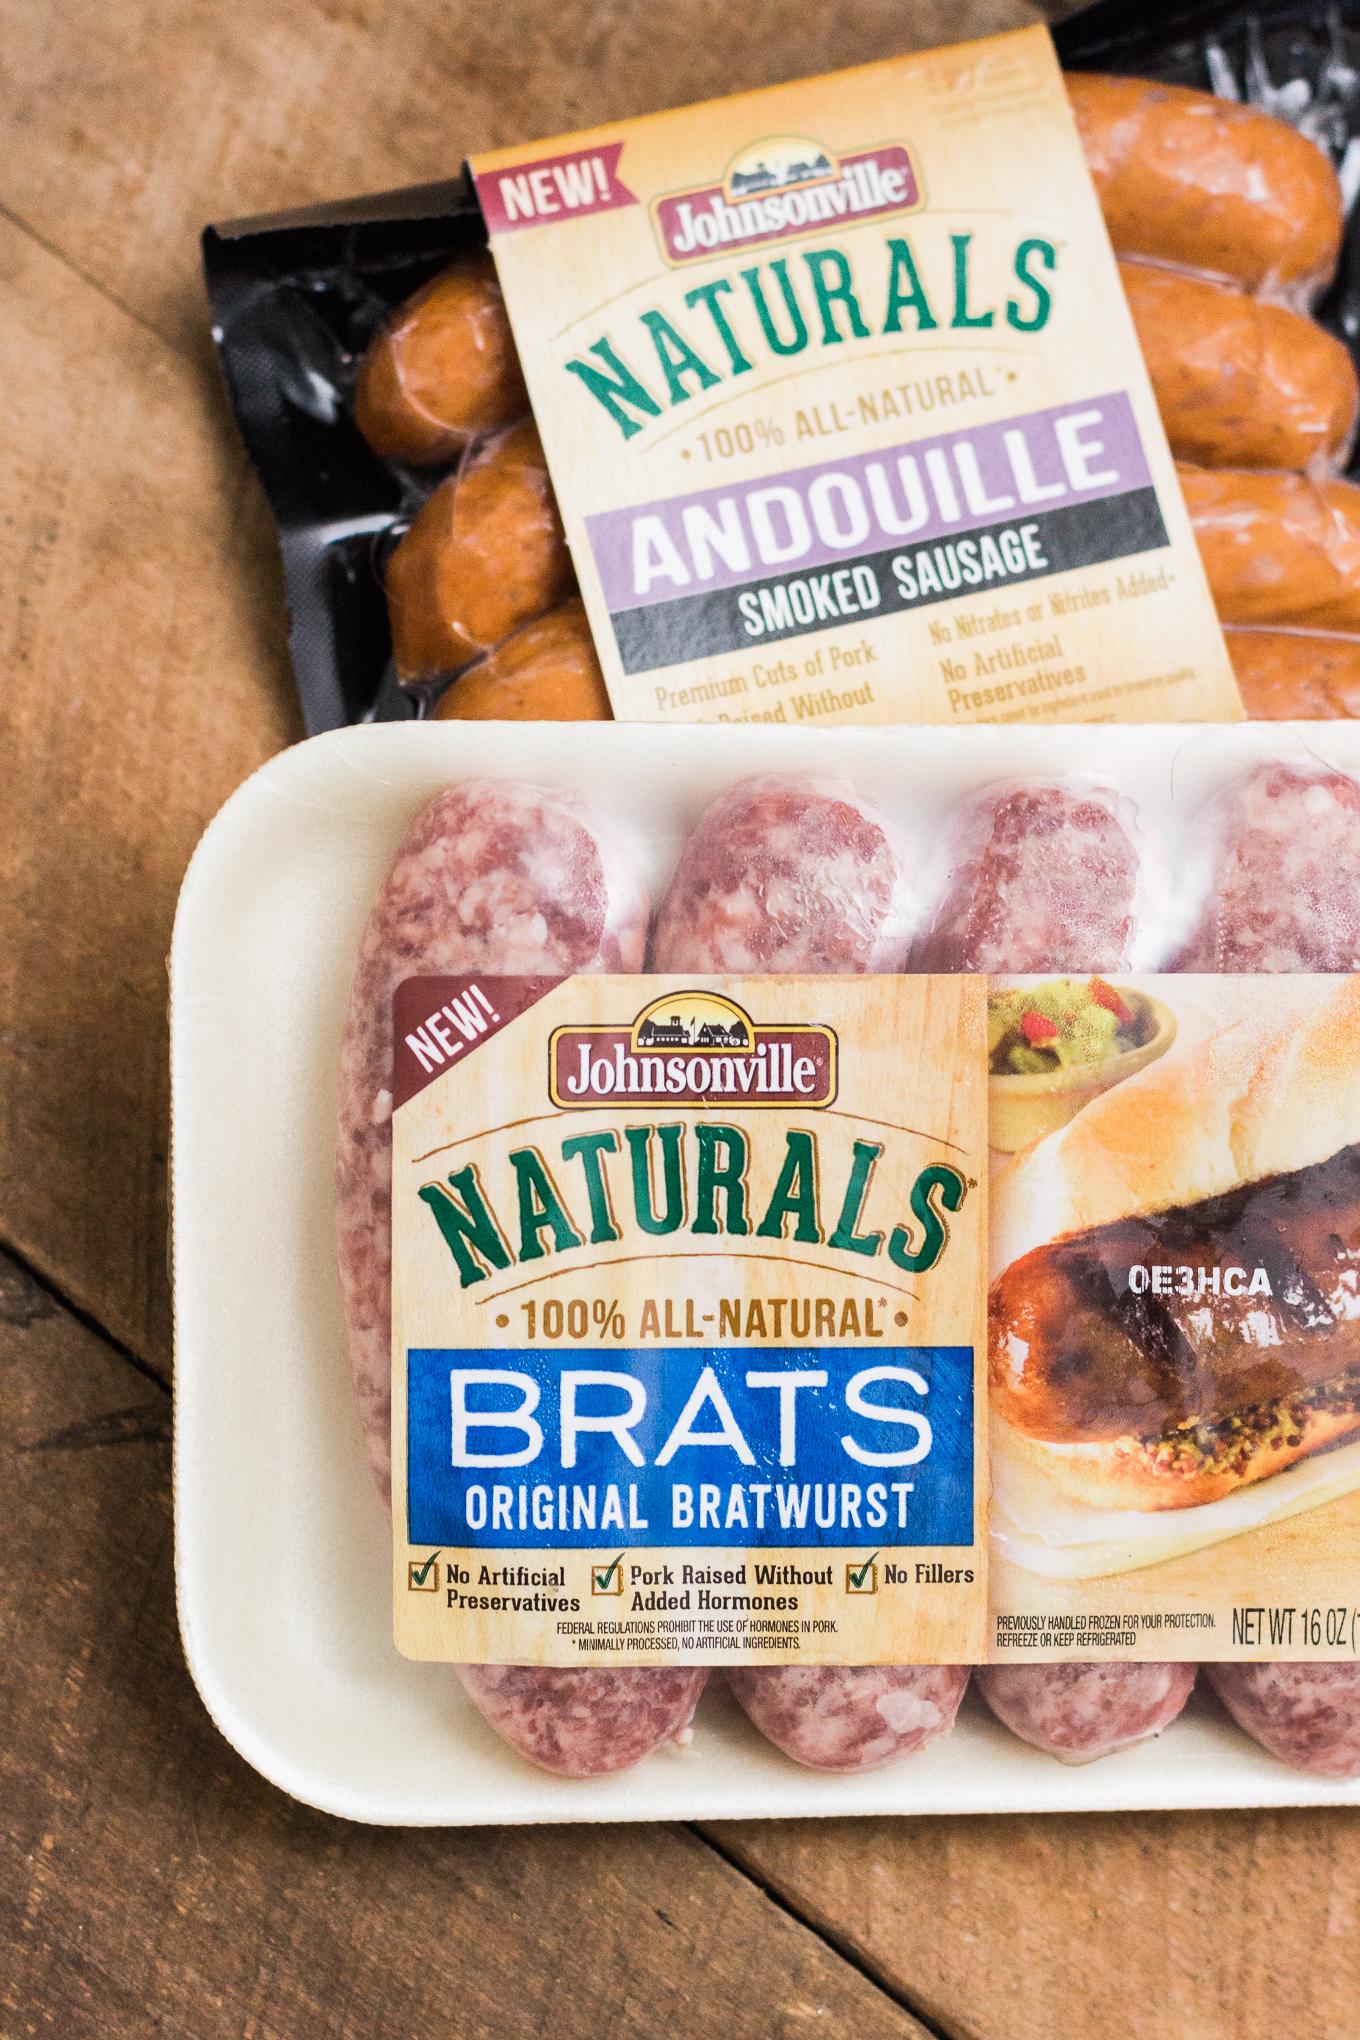 johnsonville brats, cucumber slaw, food blog, cooking blog, all natural brats